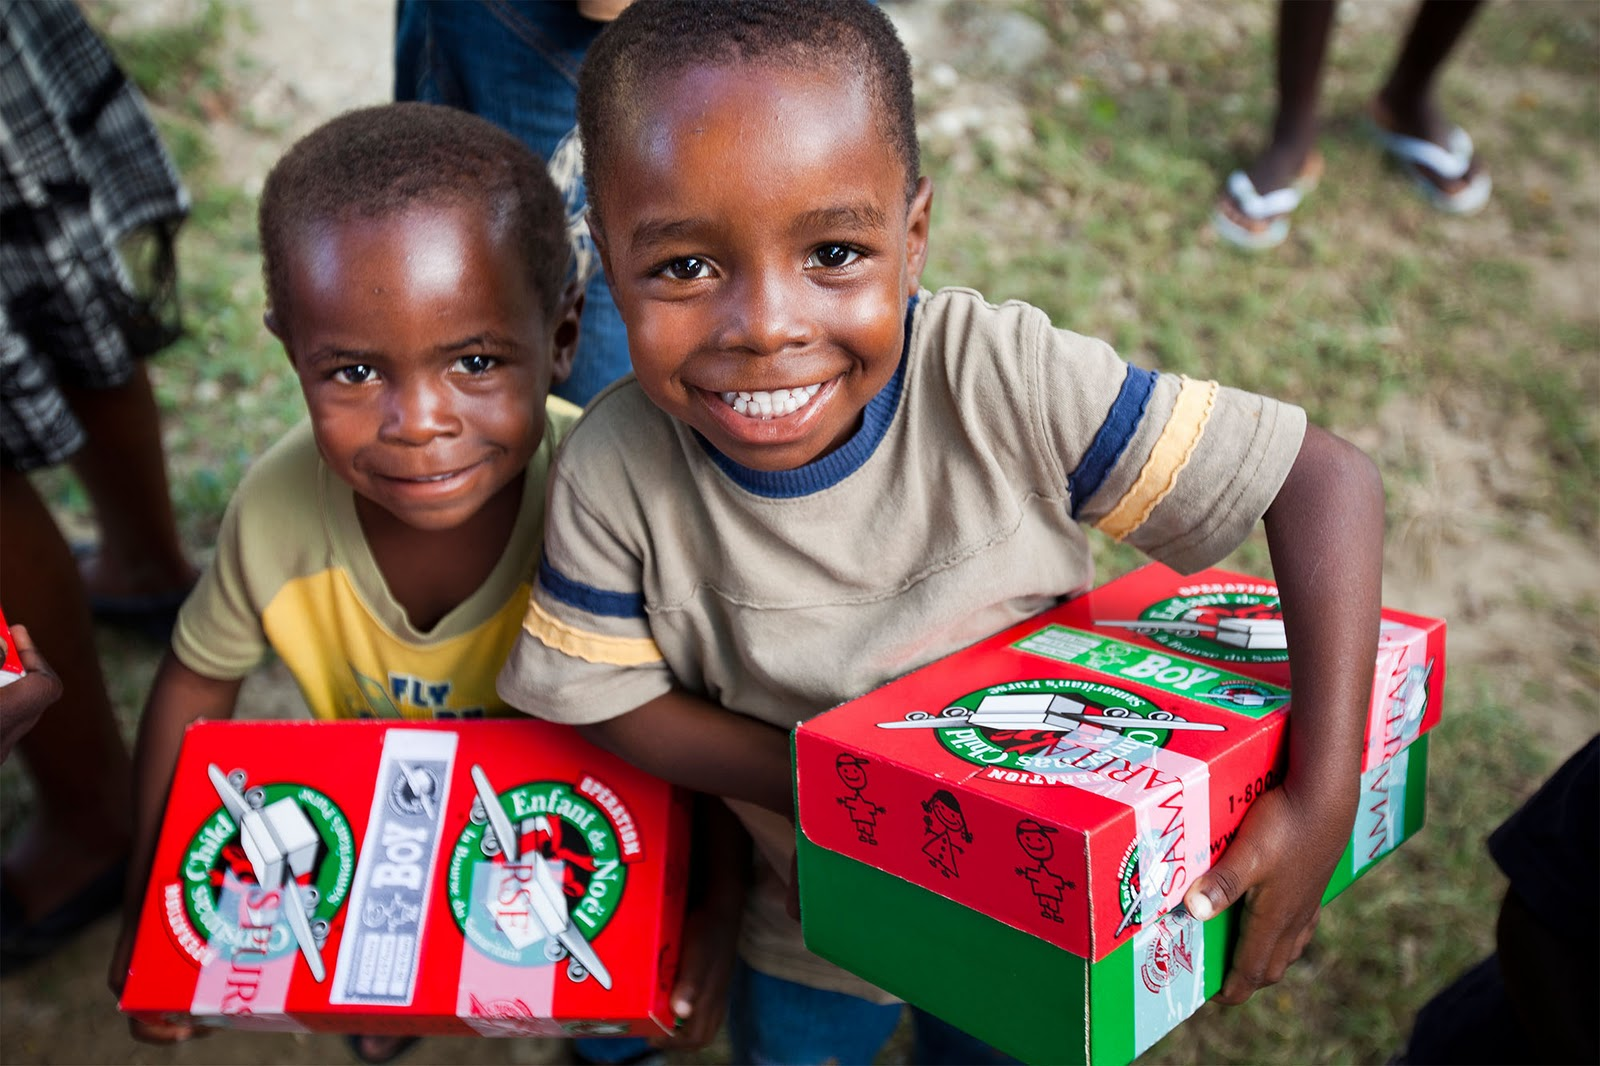 httpwwwnewswirecaenstory856569gift filled shoe boxes help brighten children s lives worldwide - Operation Christmas Child Images